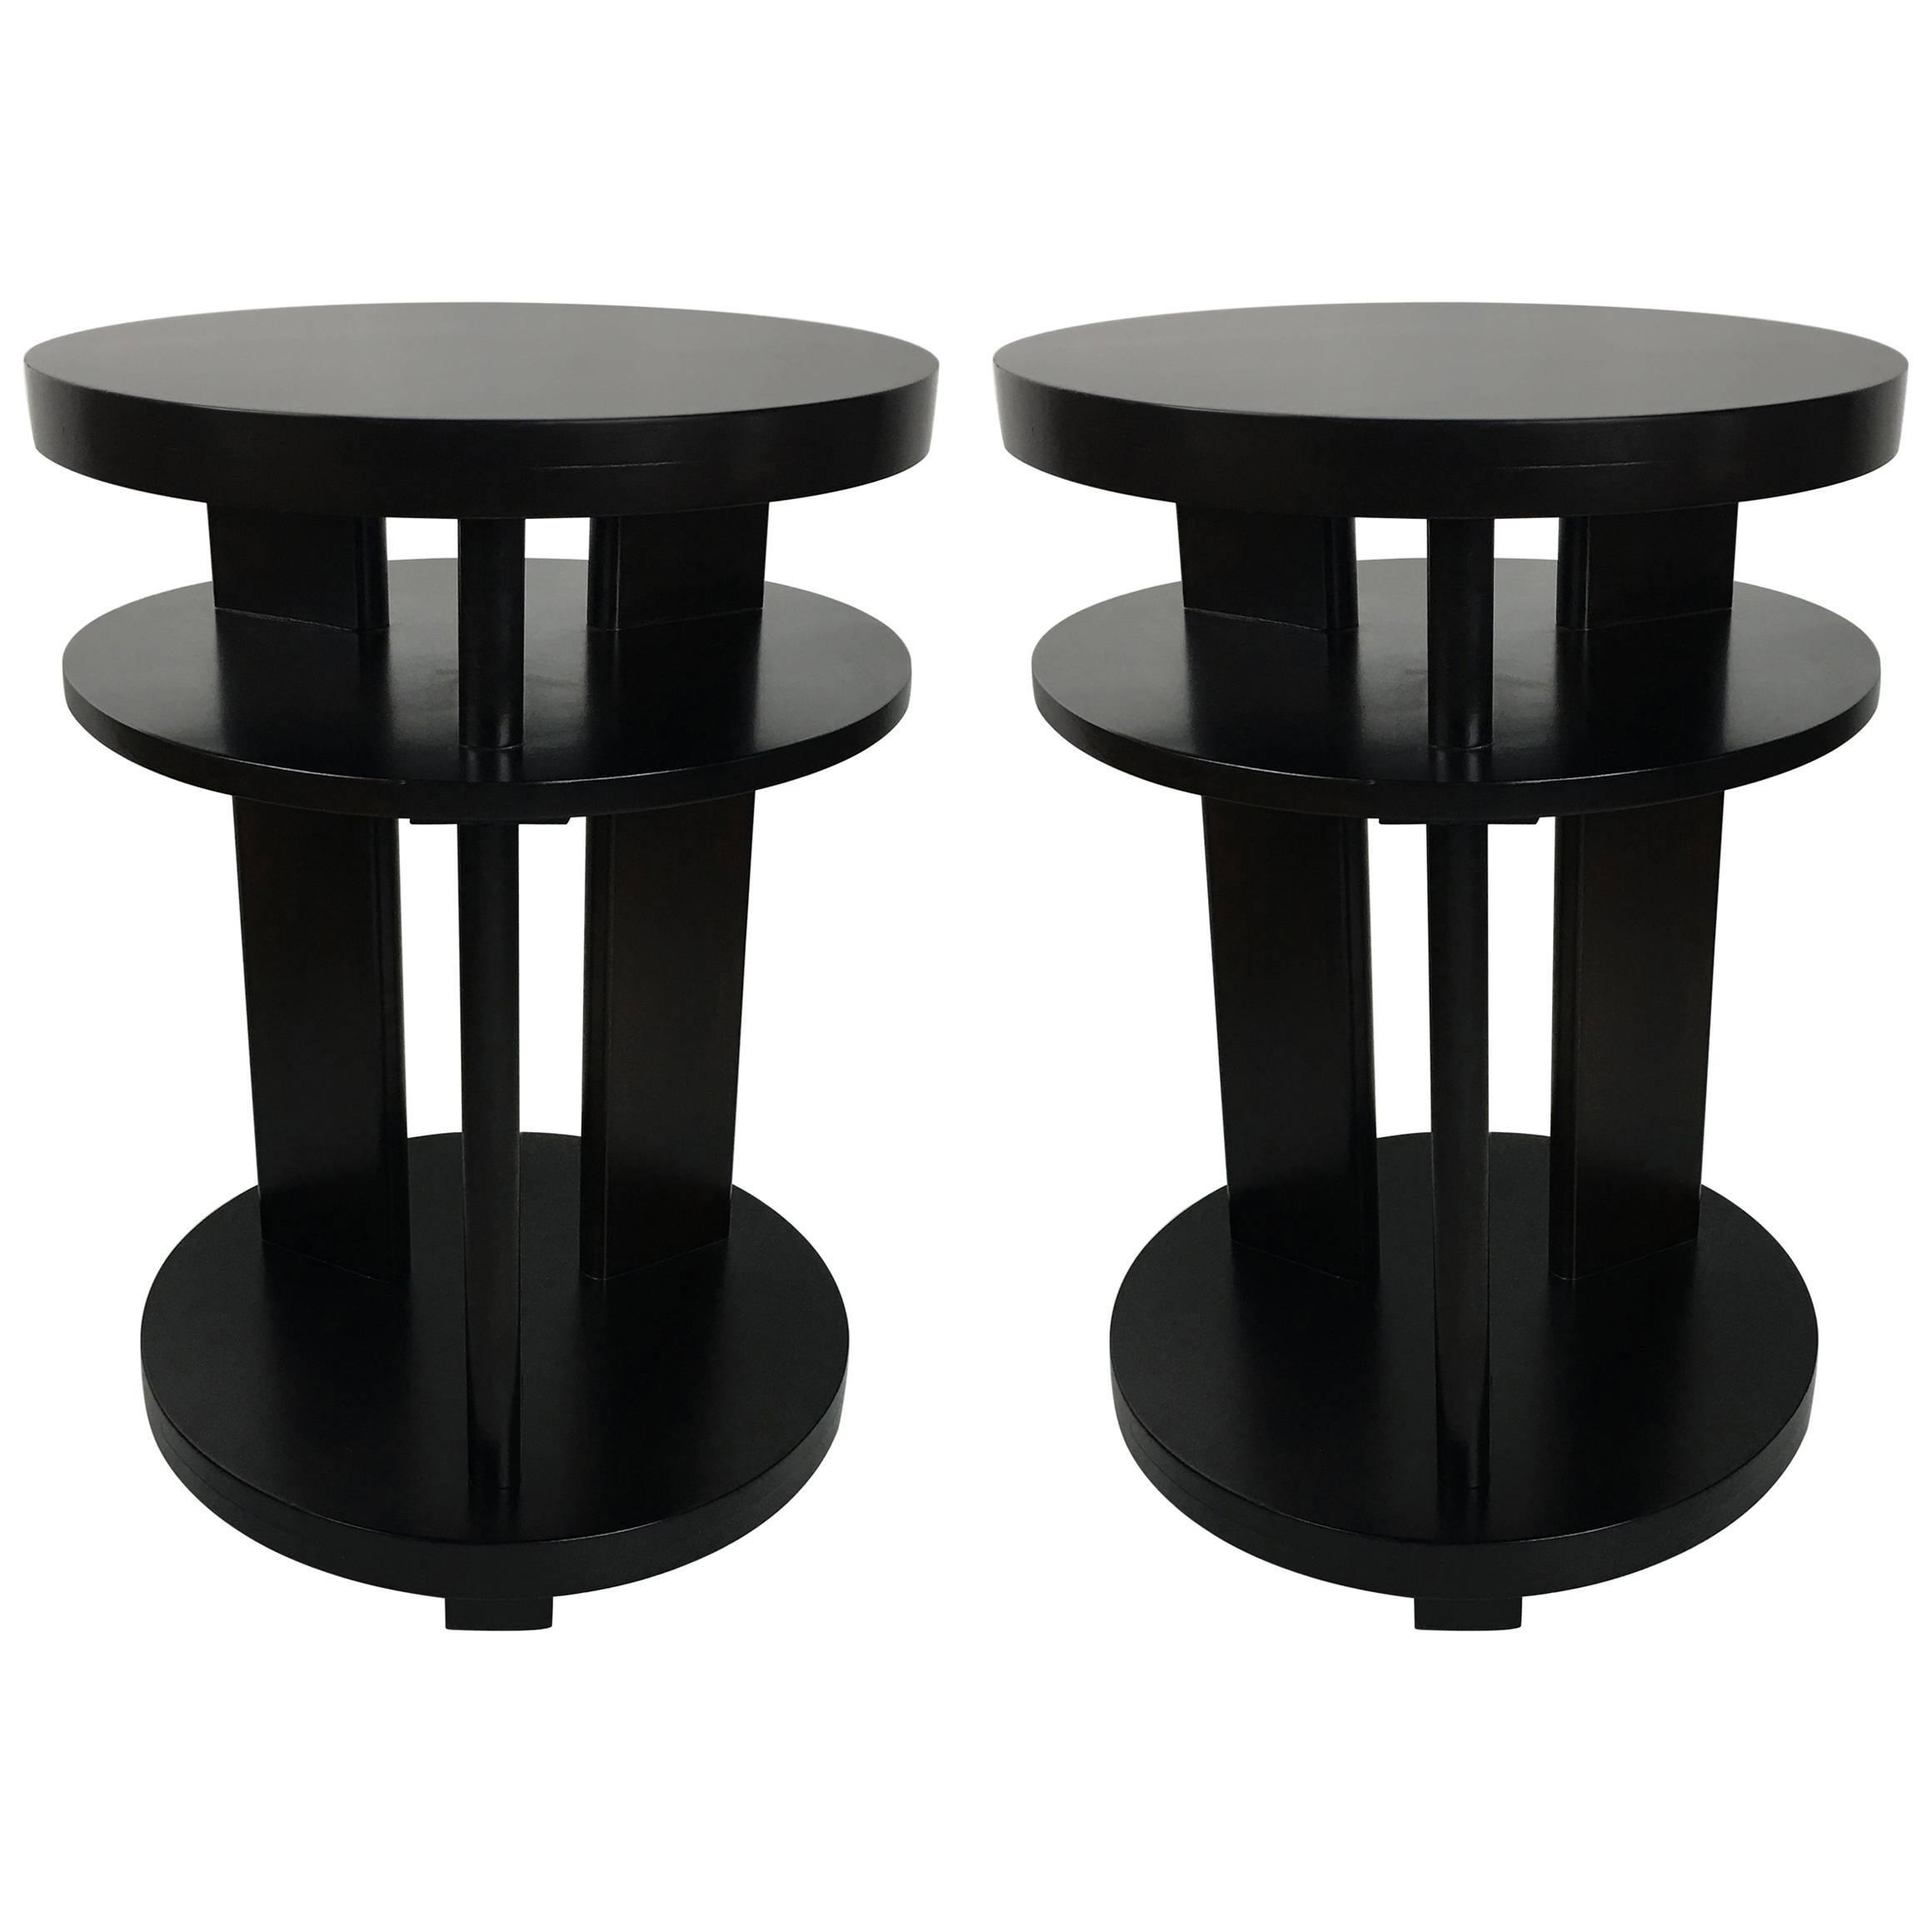 Pair of Ebonized Mahogany Side Tables by Paul Laszlo